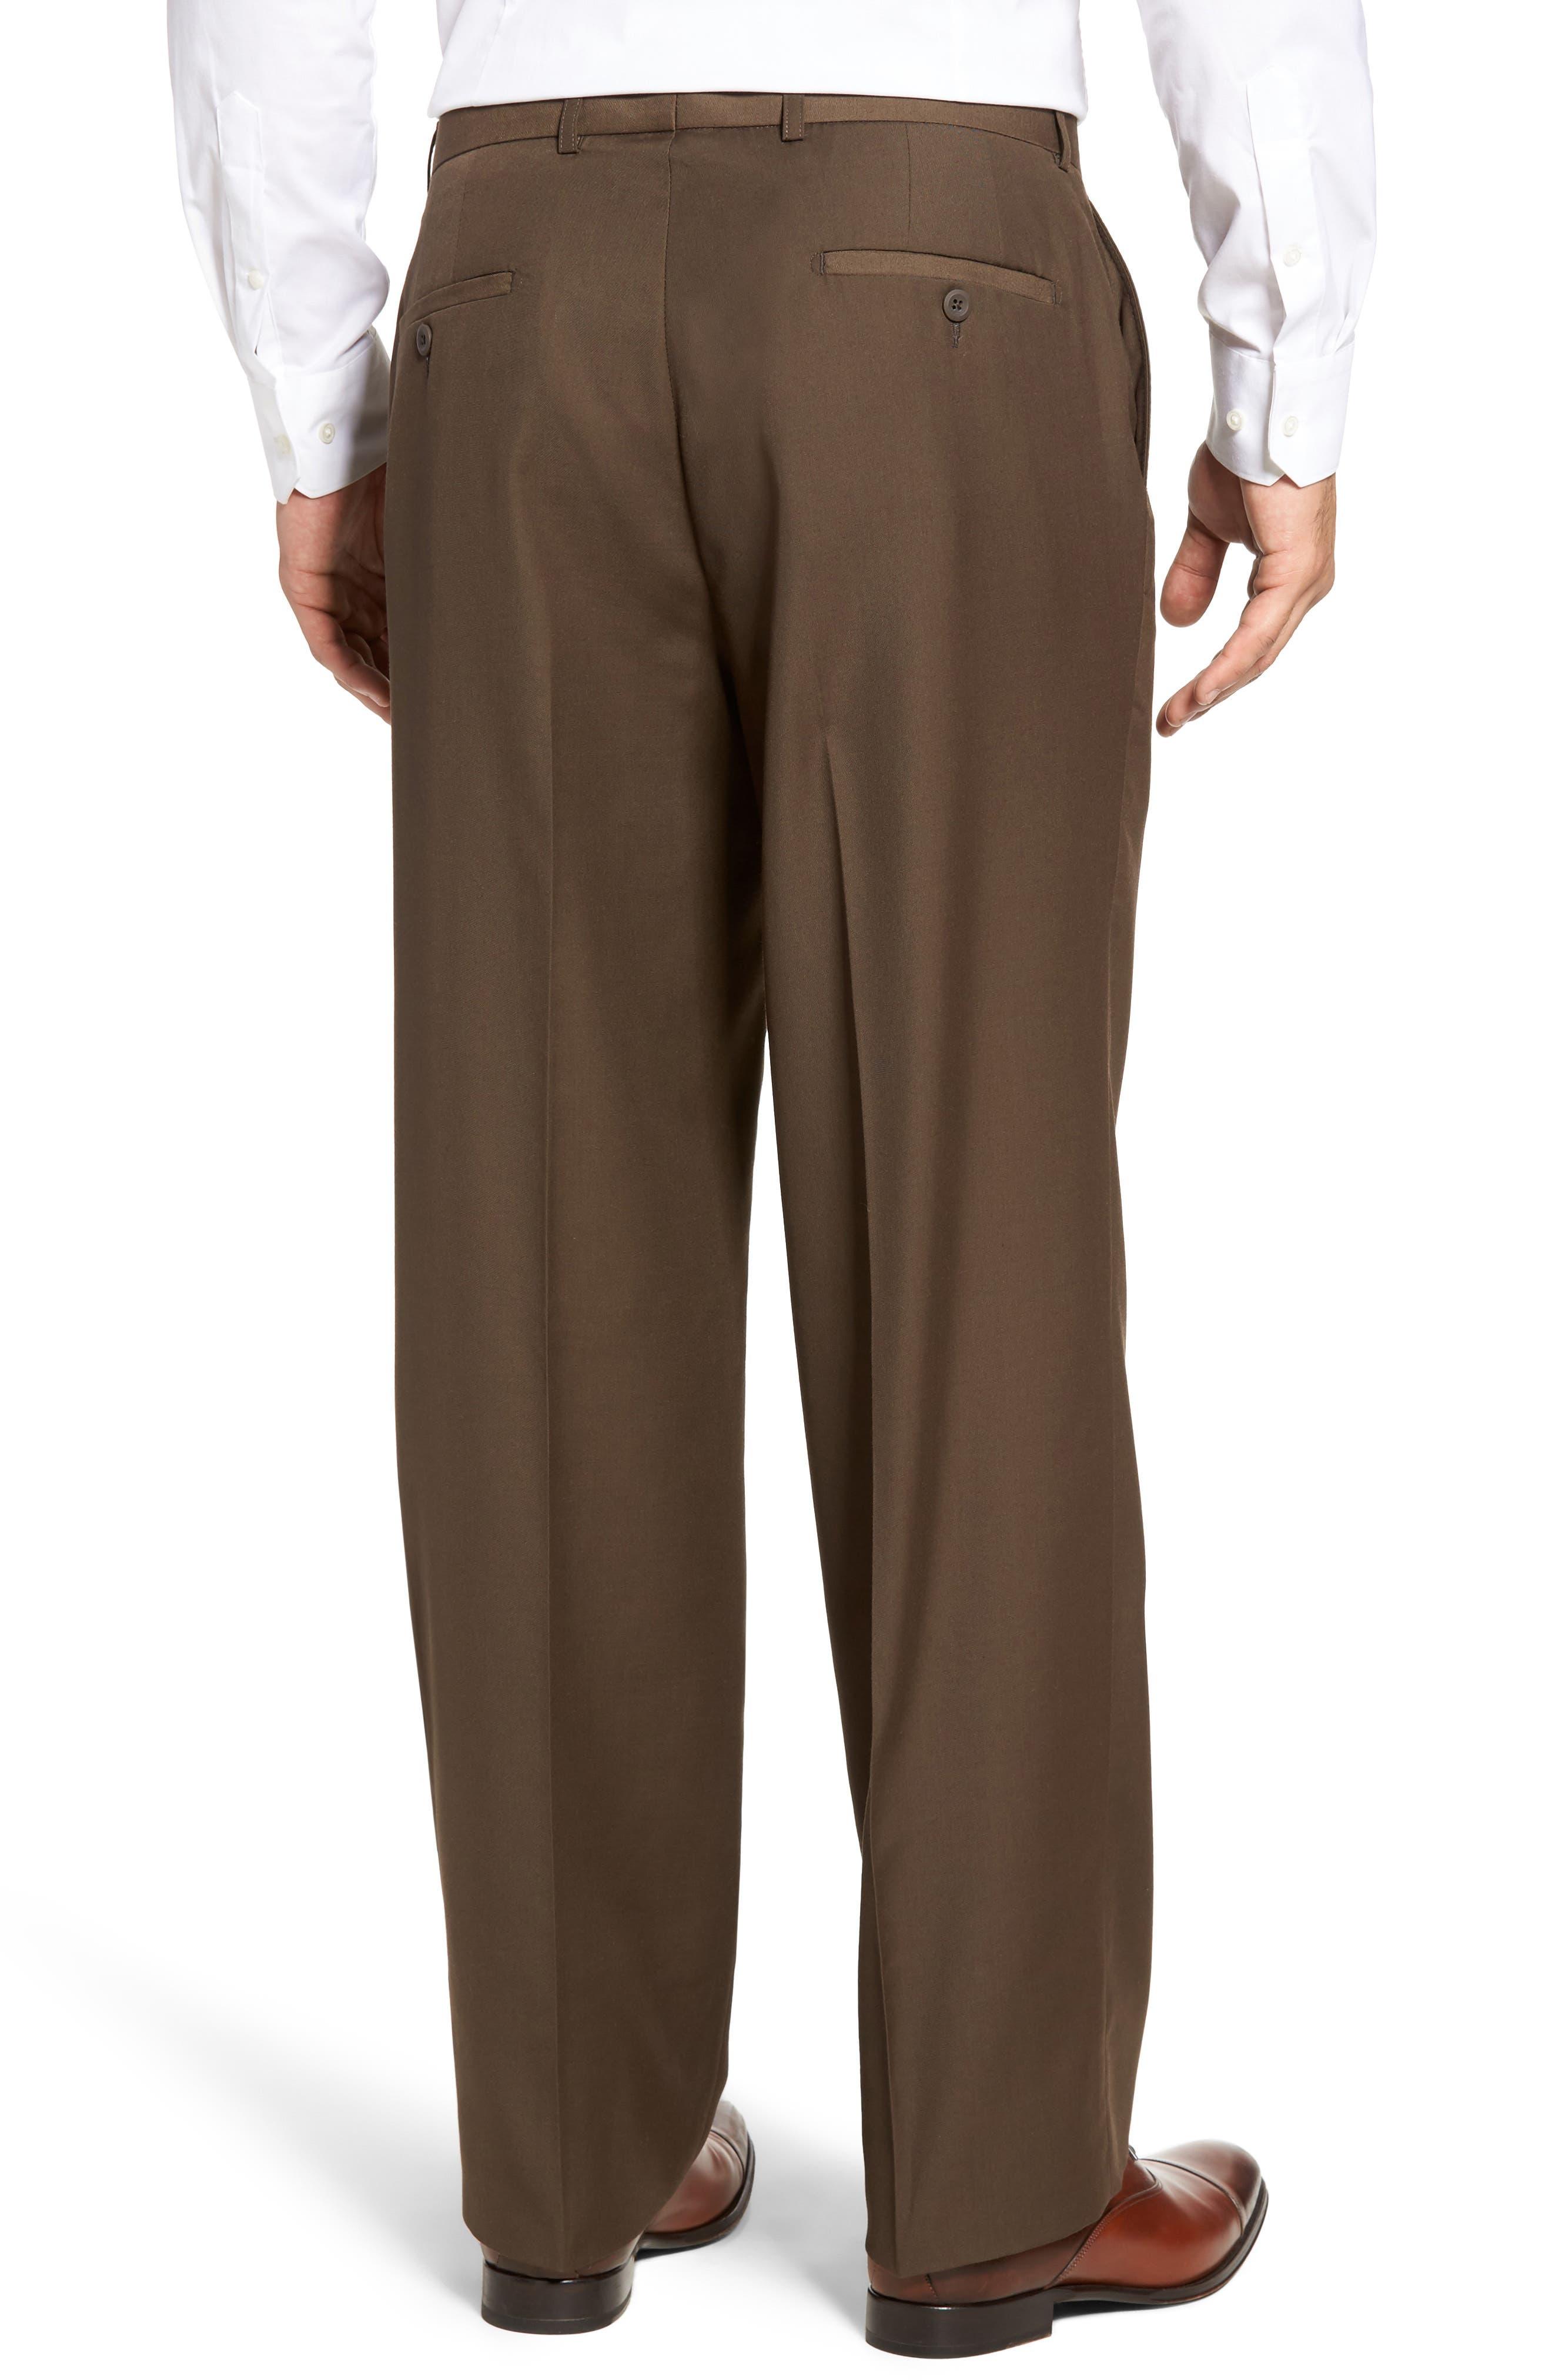 'Travel Genius - Hawk' Flat Front Pants,                             Alternate thumbnail 2, color,                             Brown